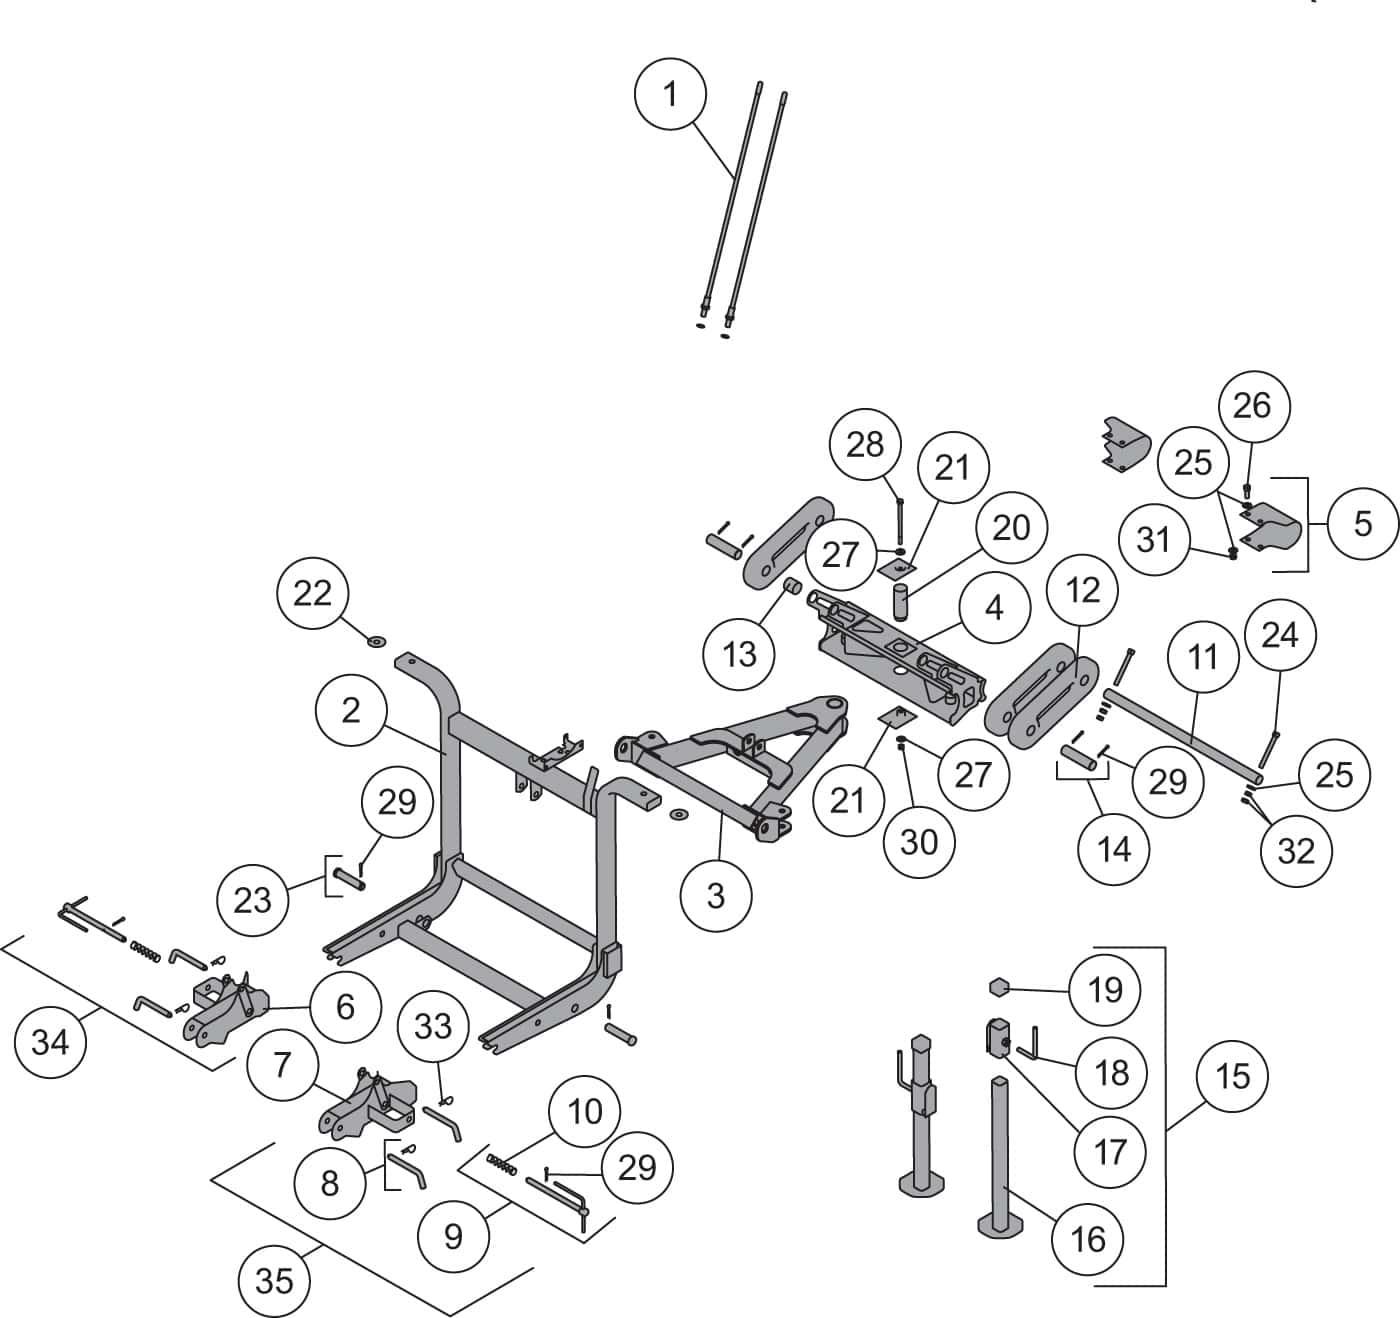 25 Fisher Plow Parts Diagram